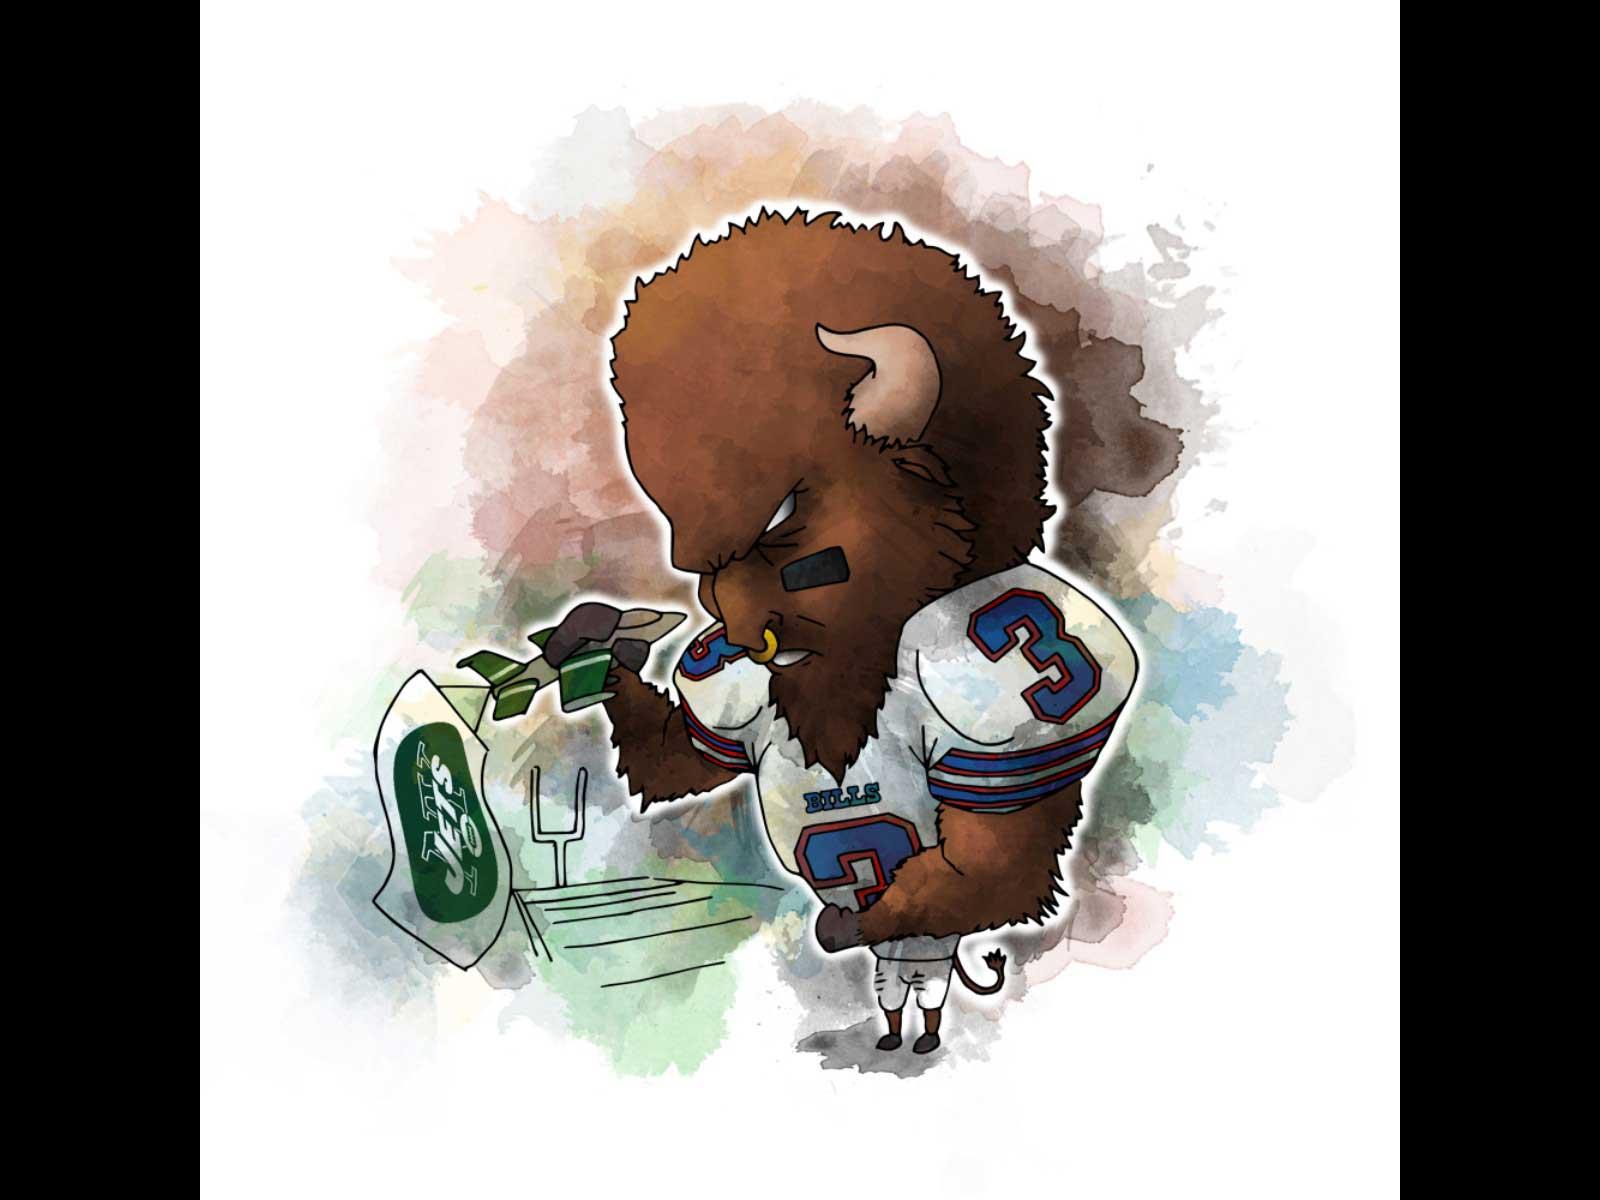 Michael Biondo Creates Digital Illustrations For The Buffalo